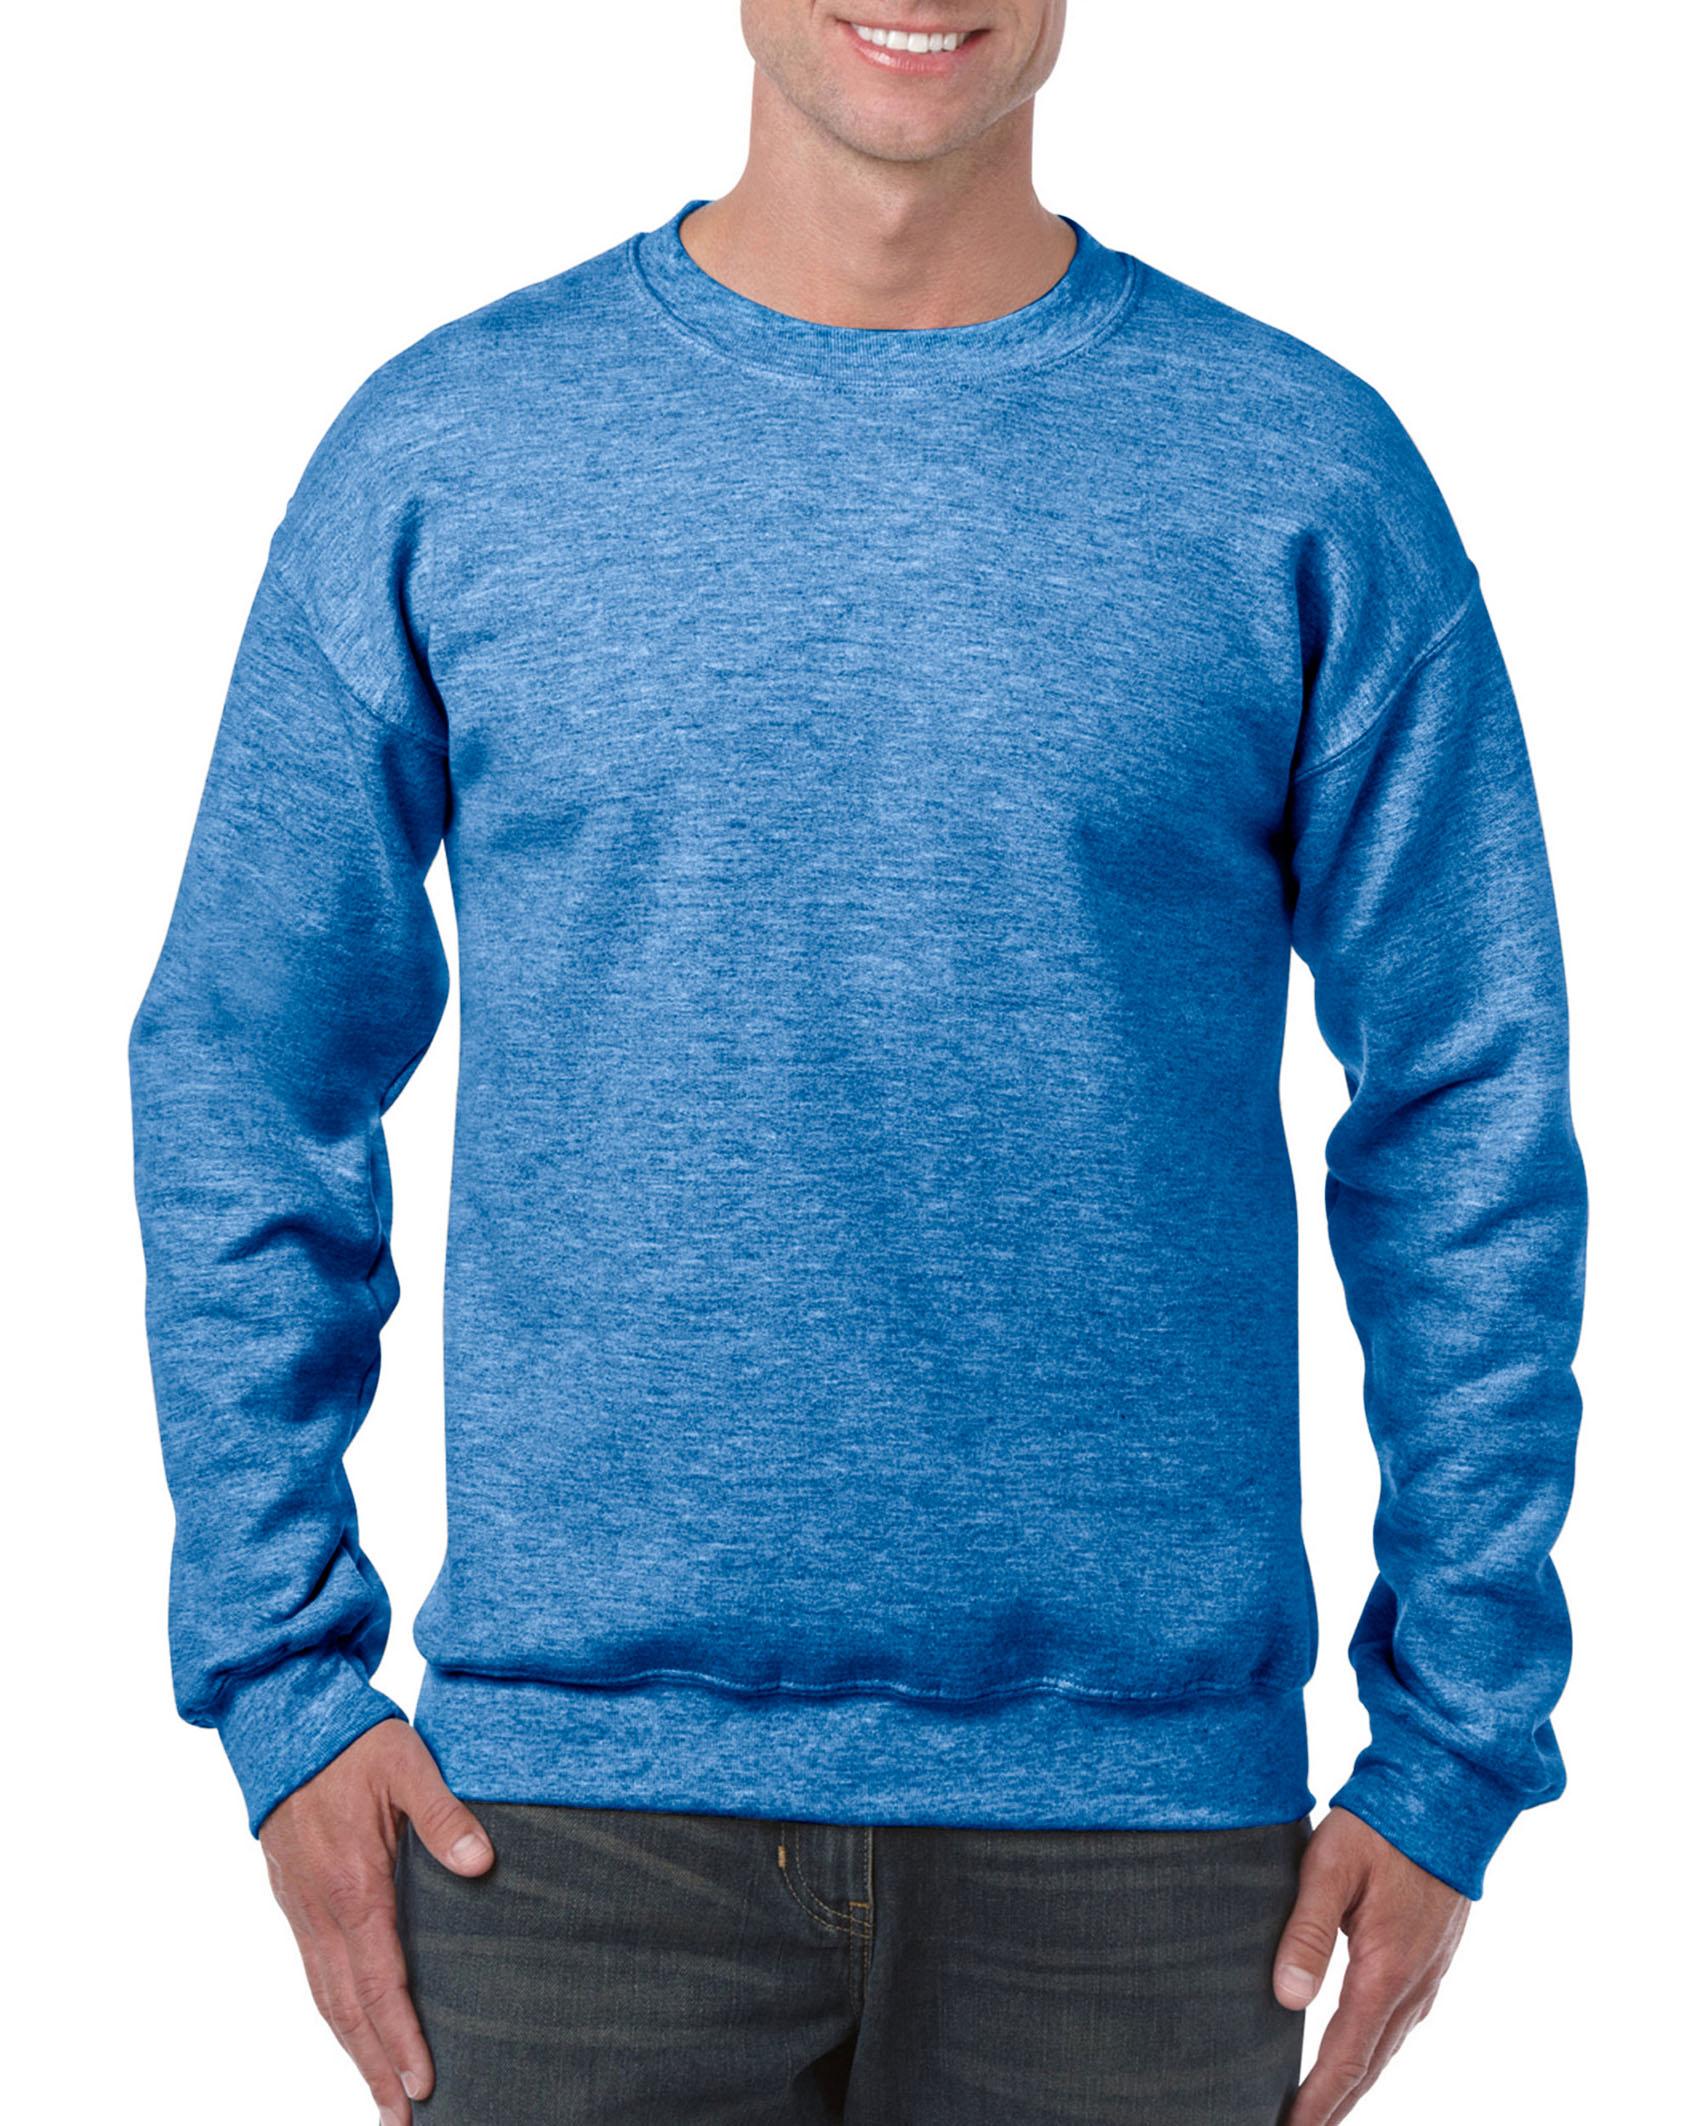 25St Gildan Sweater incl. 1k opdruk (Heather Royal)